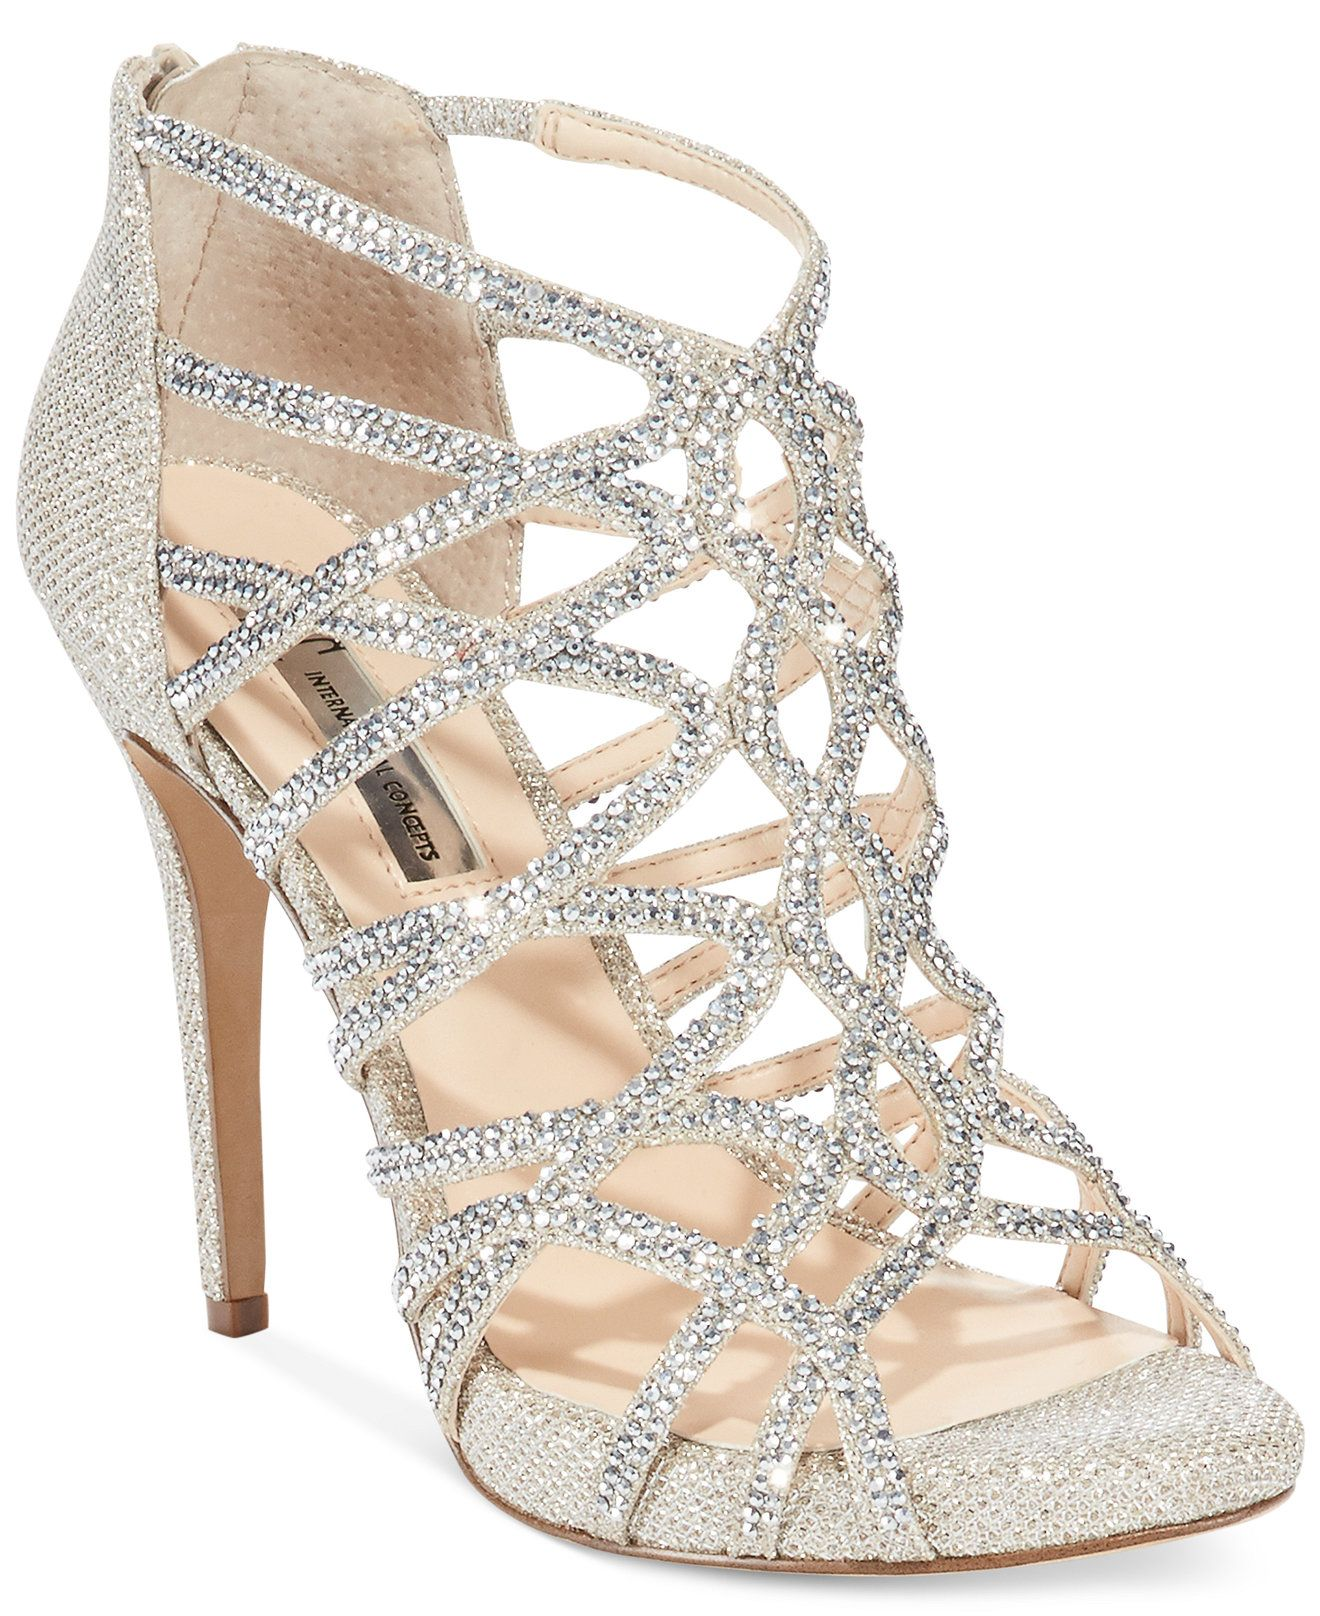 Flat rhinestone sandals for wedding - Inc International Concepts Women S Sharee High Heel Rhinestone Evening Sandals Sandals Shoes Macy S